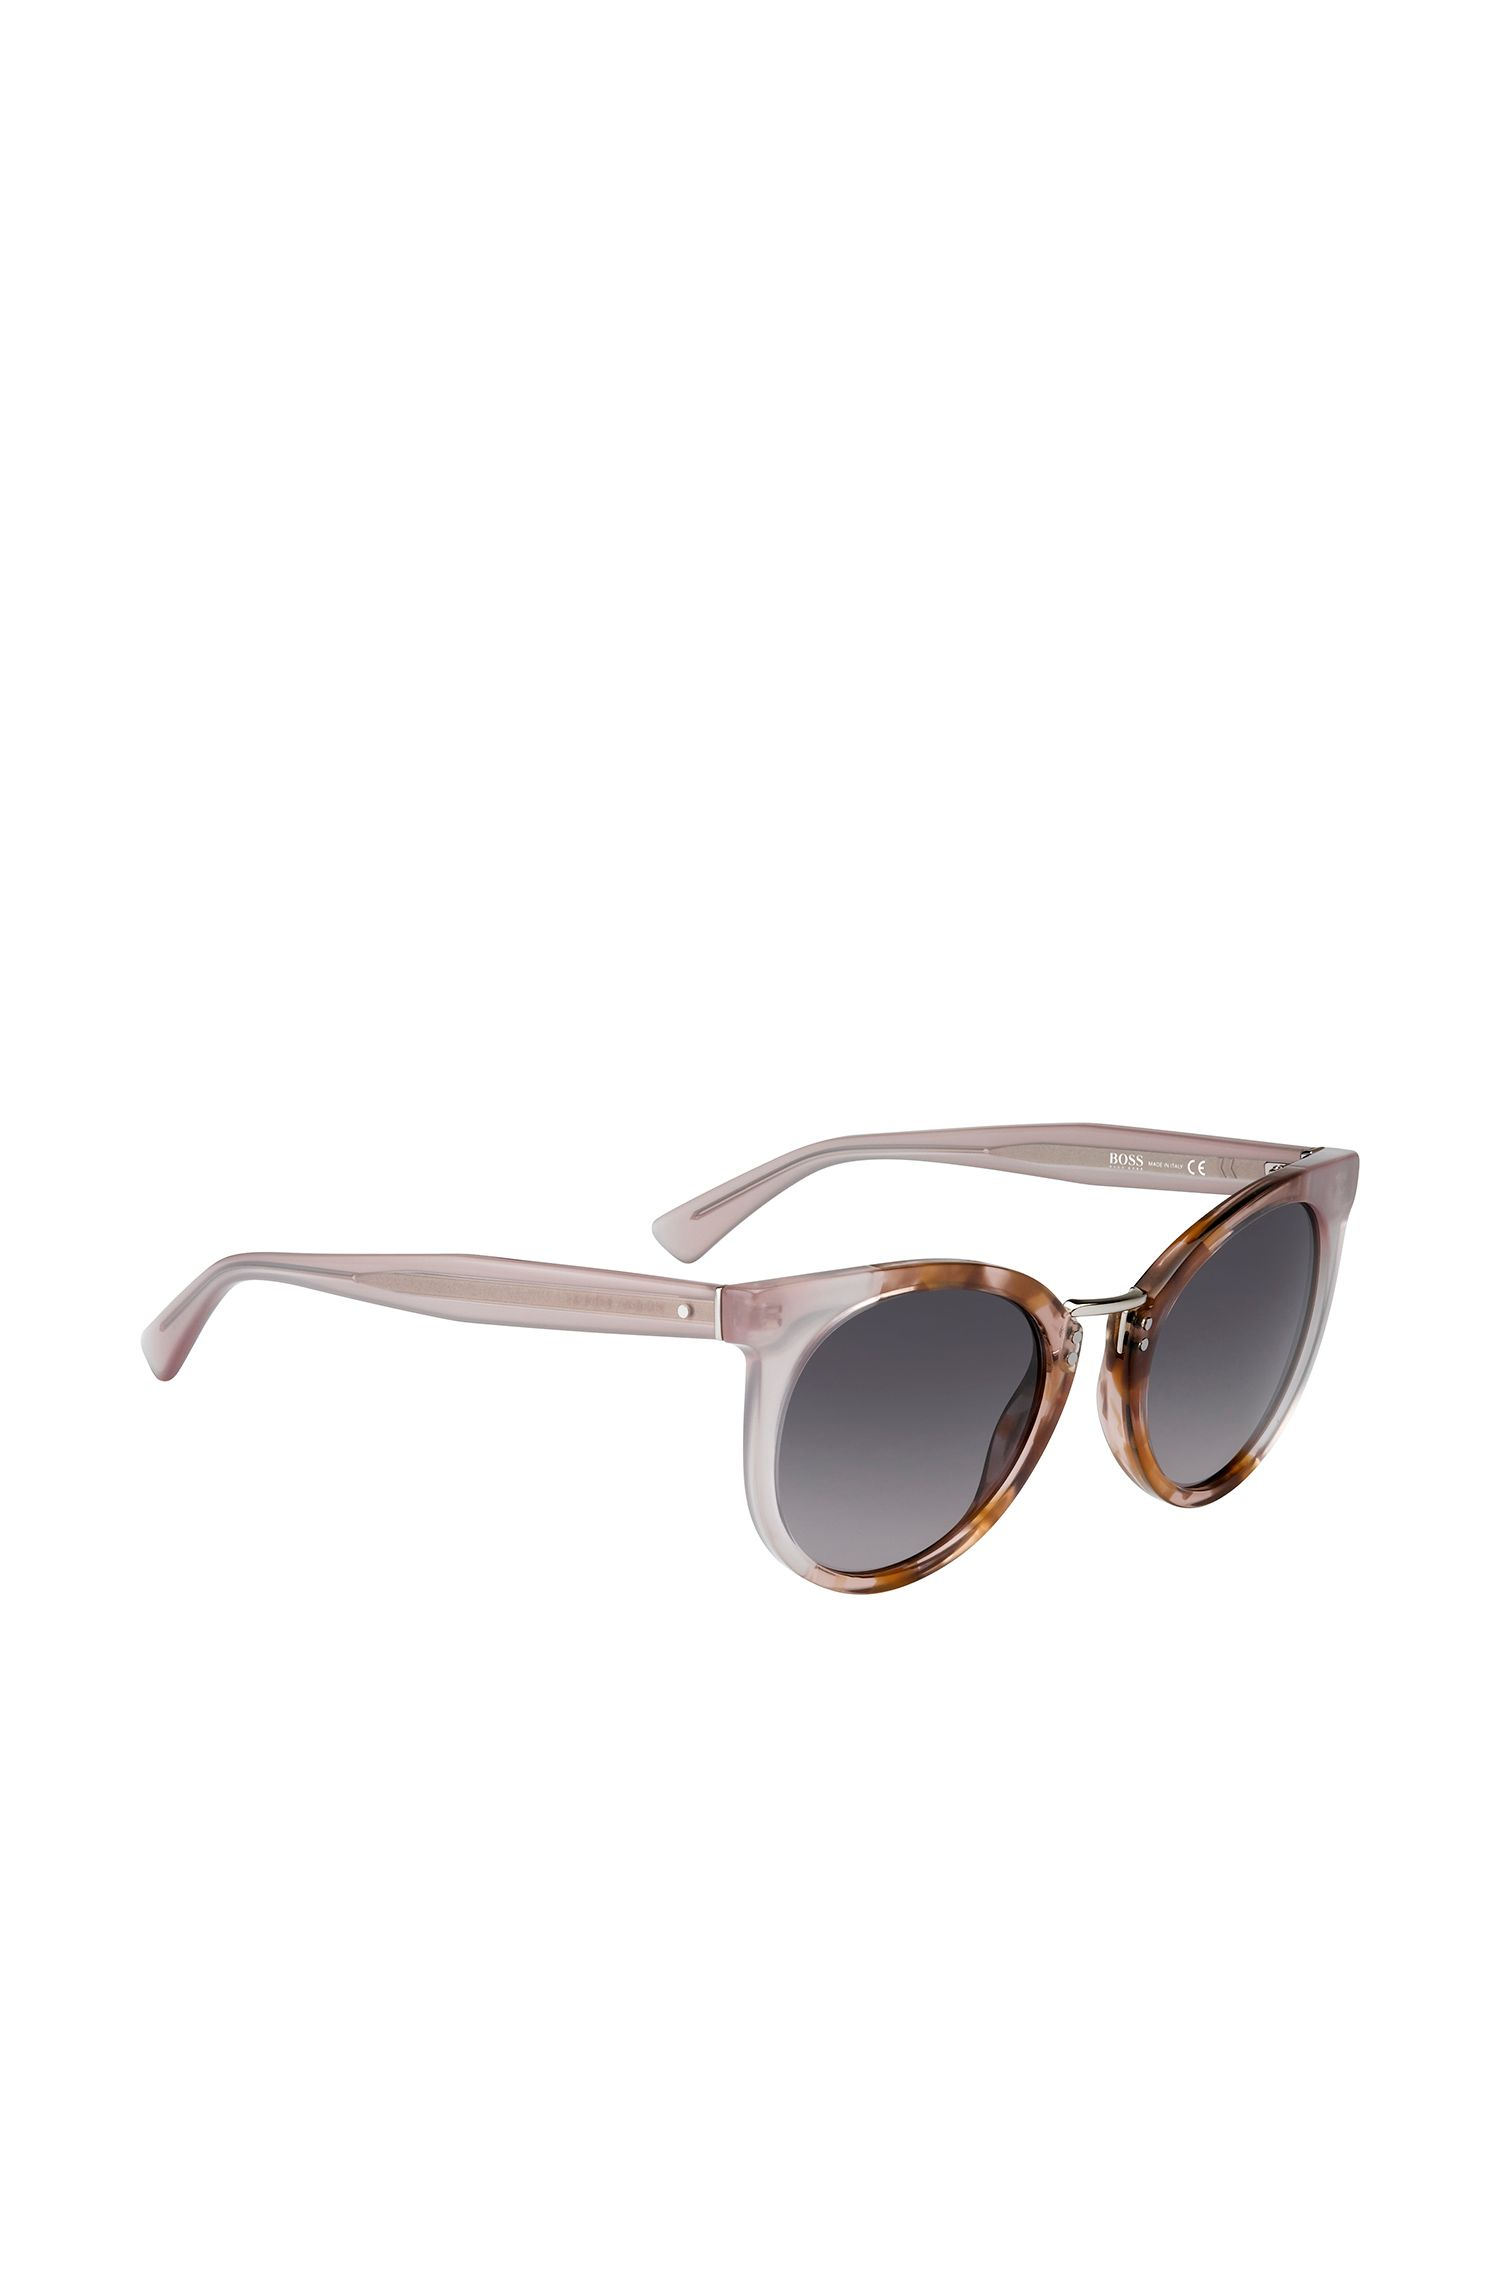 'BOSS 0793S'   Gray Lens Rounded Cateye Havana Sunglasses